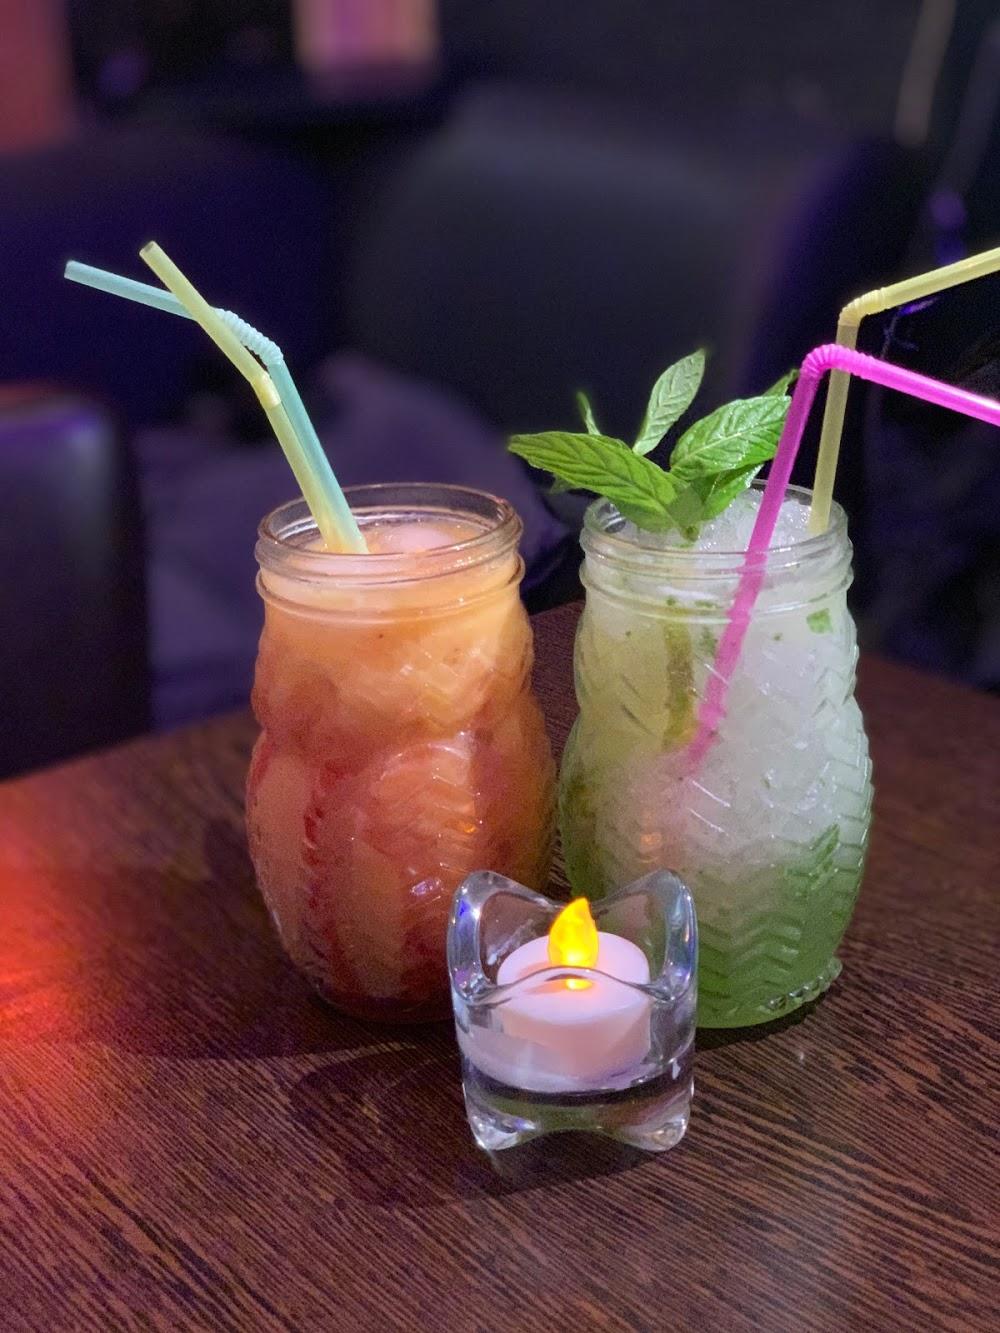 The Shed Restaurant and Shisha Lounge